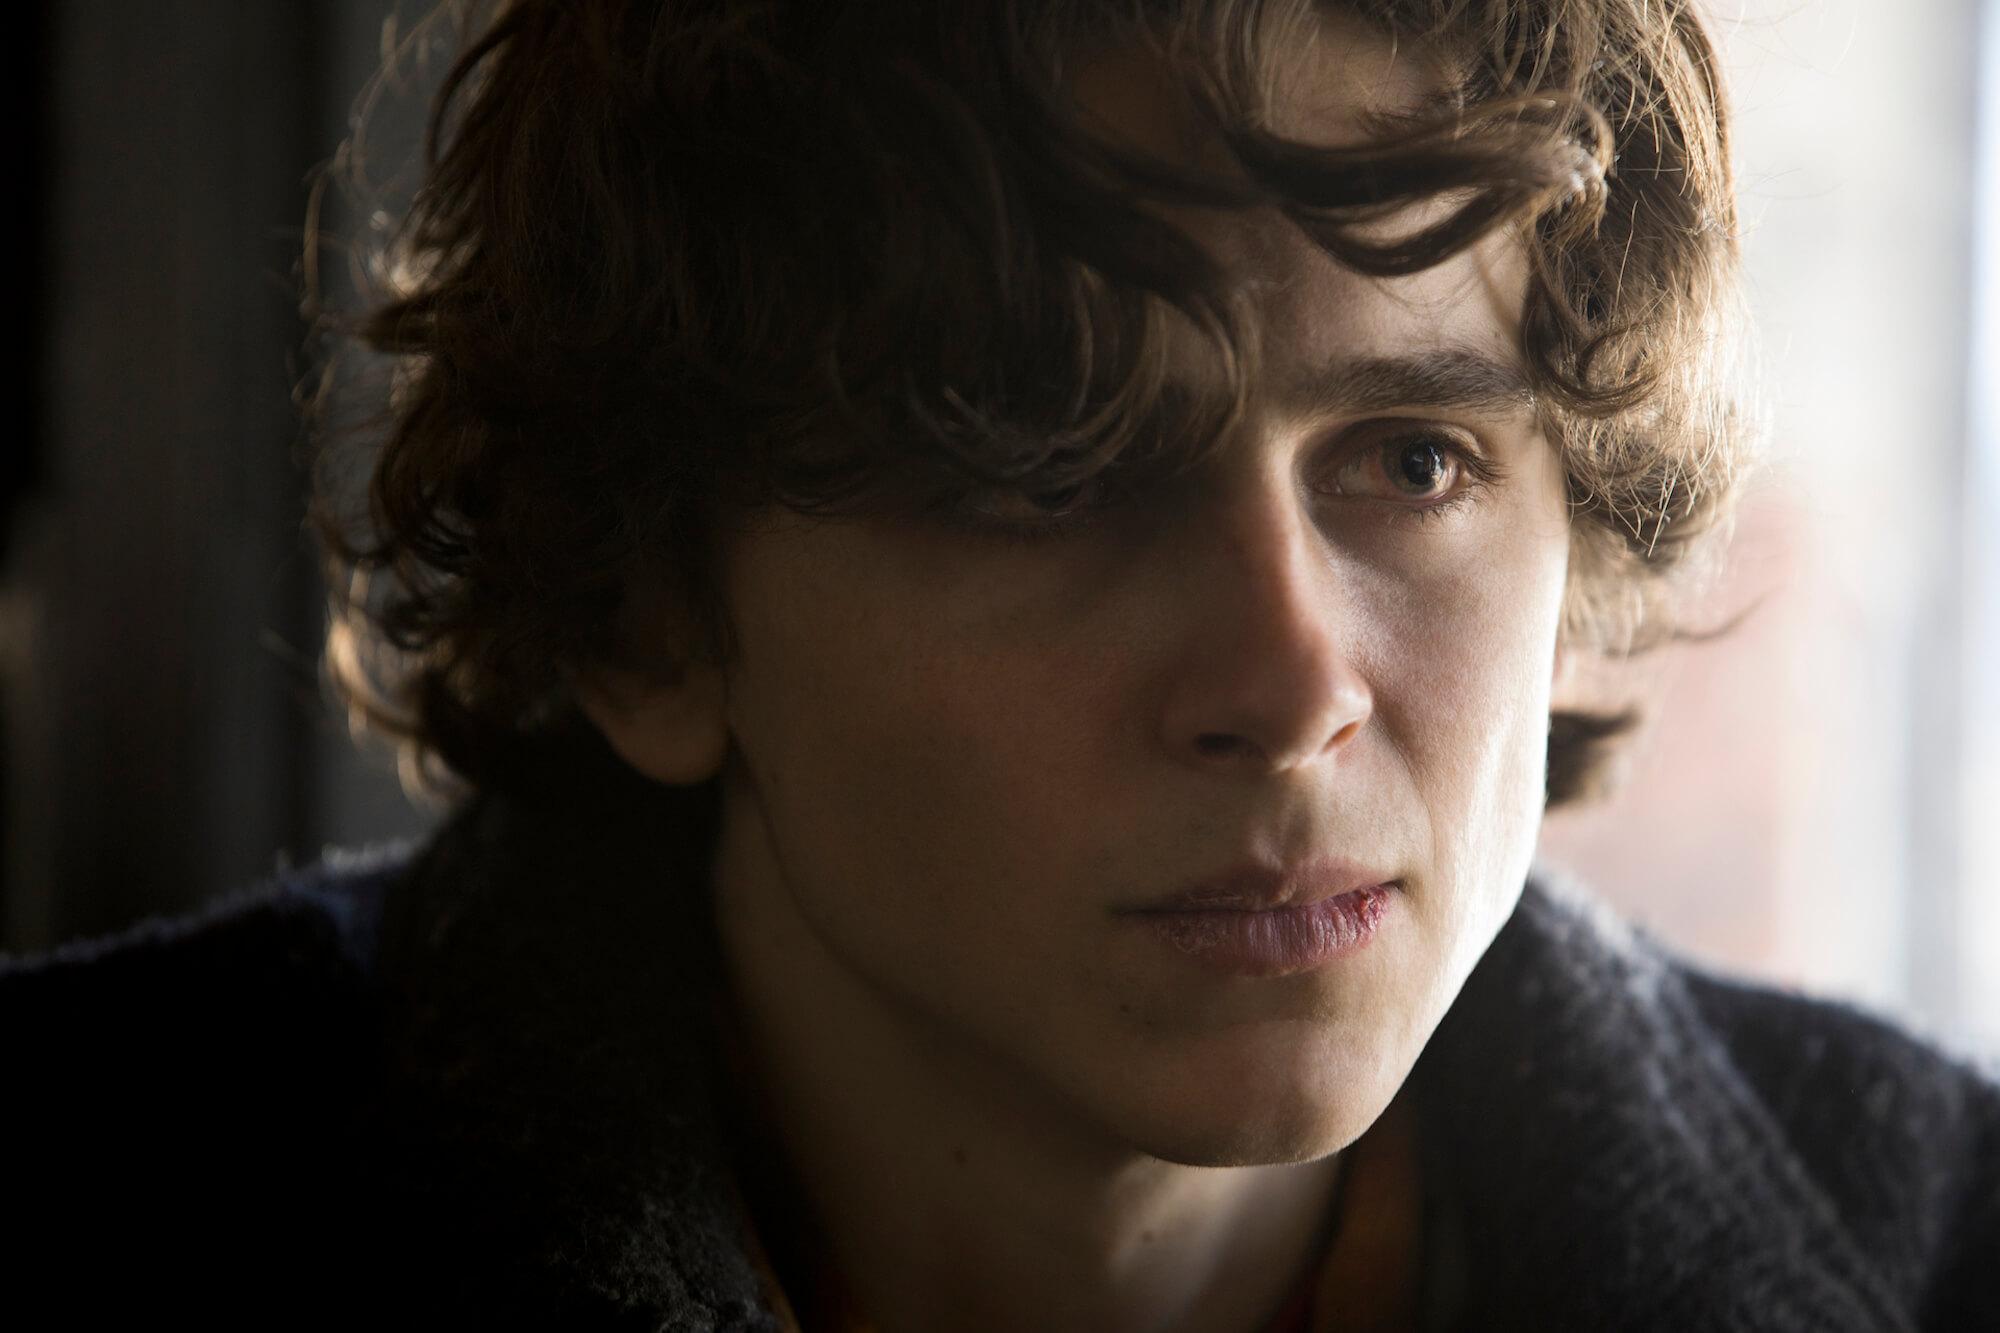 Timothée Chalamet stars as Nic Scheff in BEAUTIFUL BOY